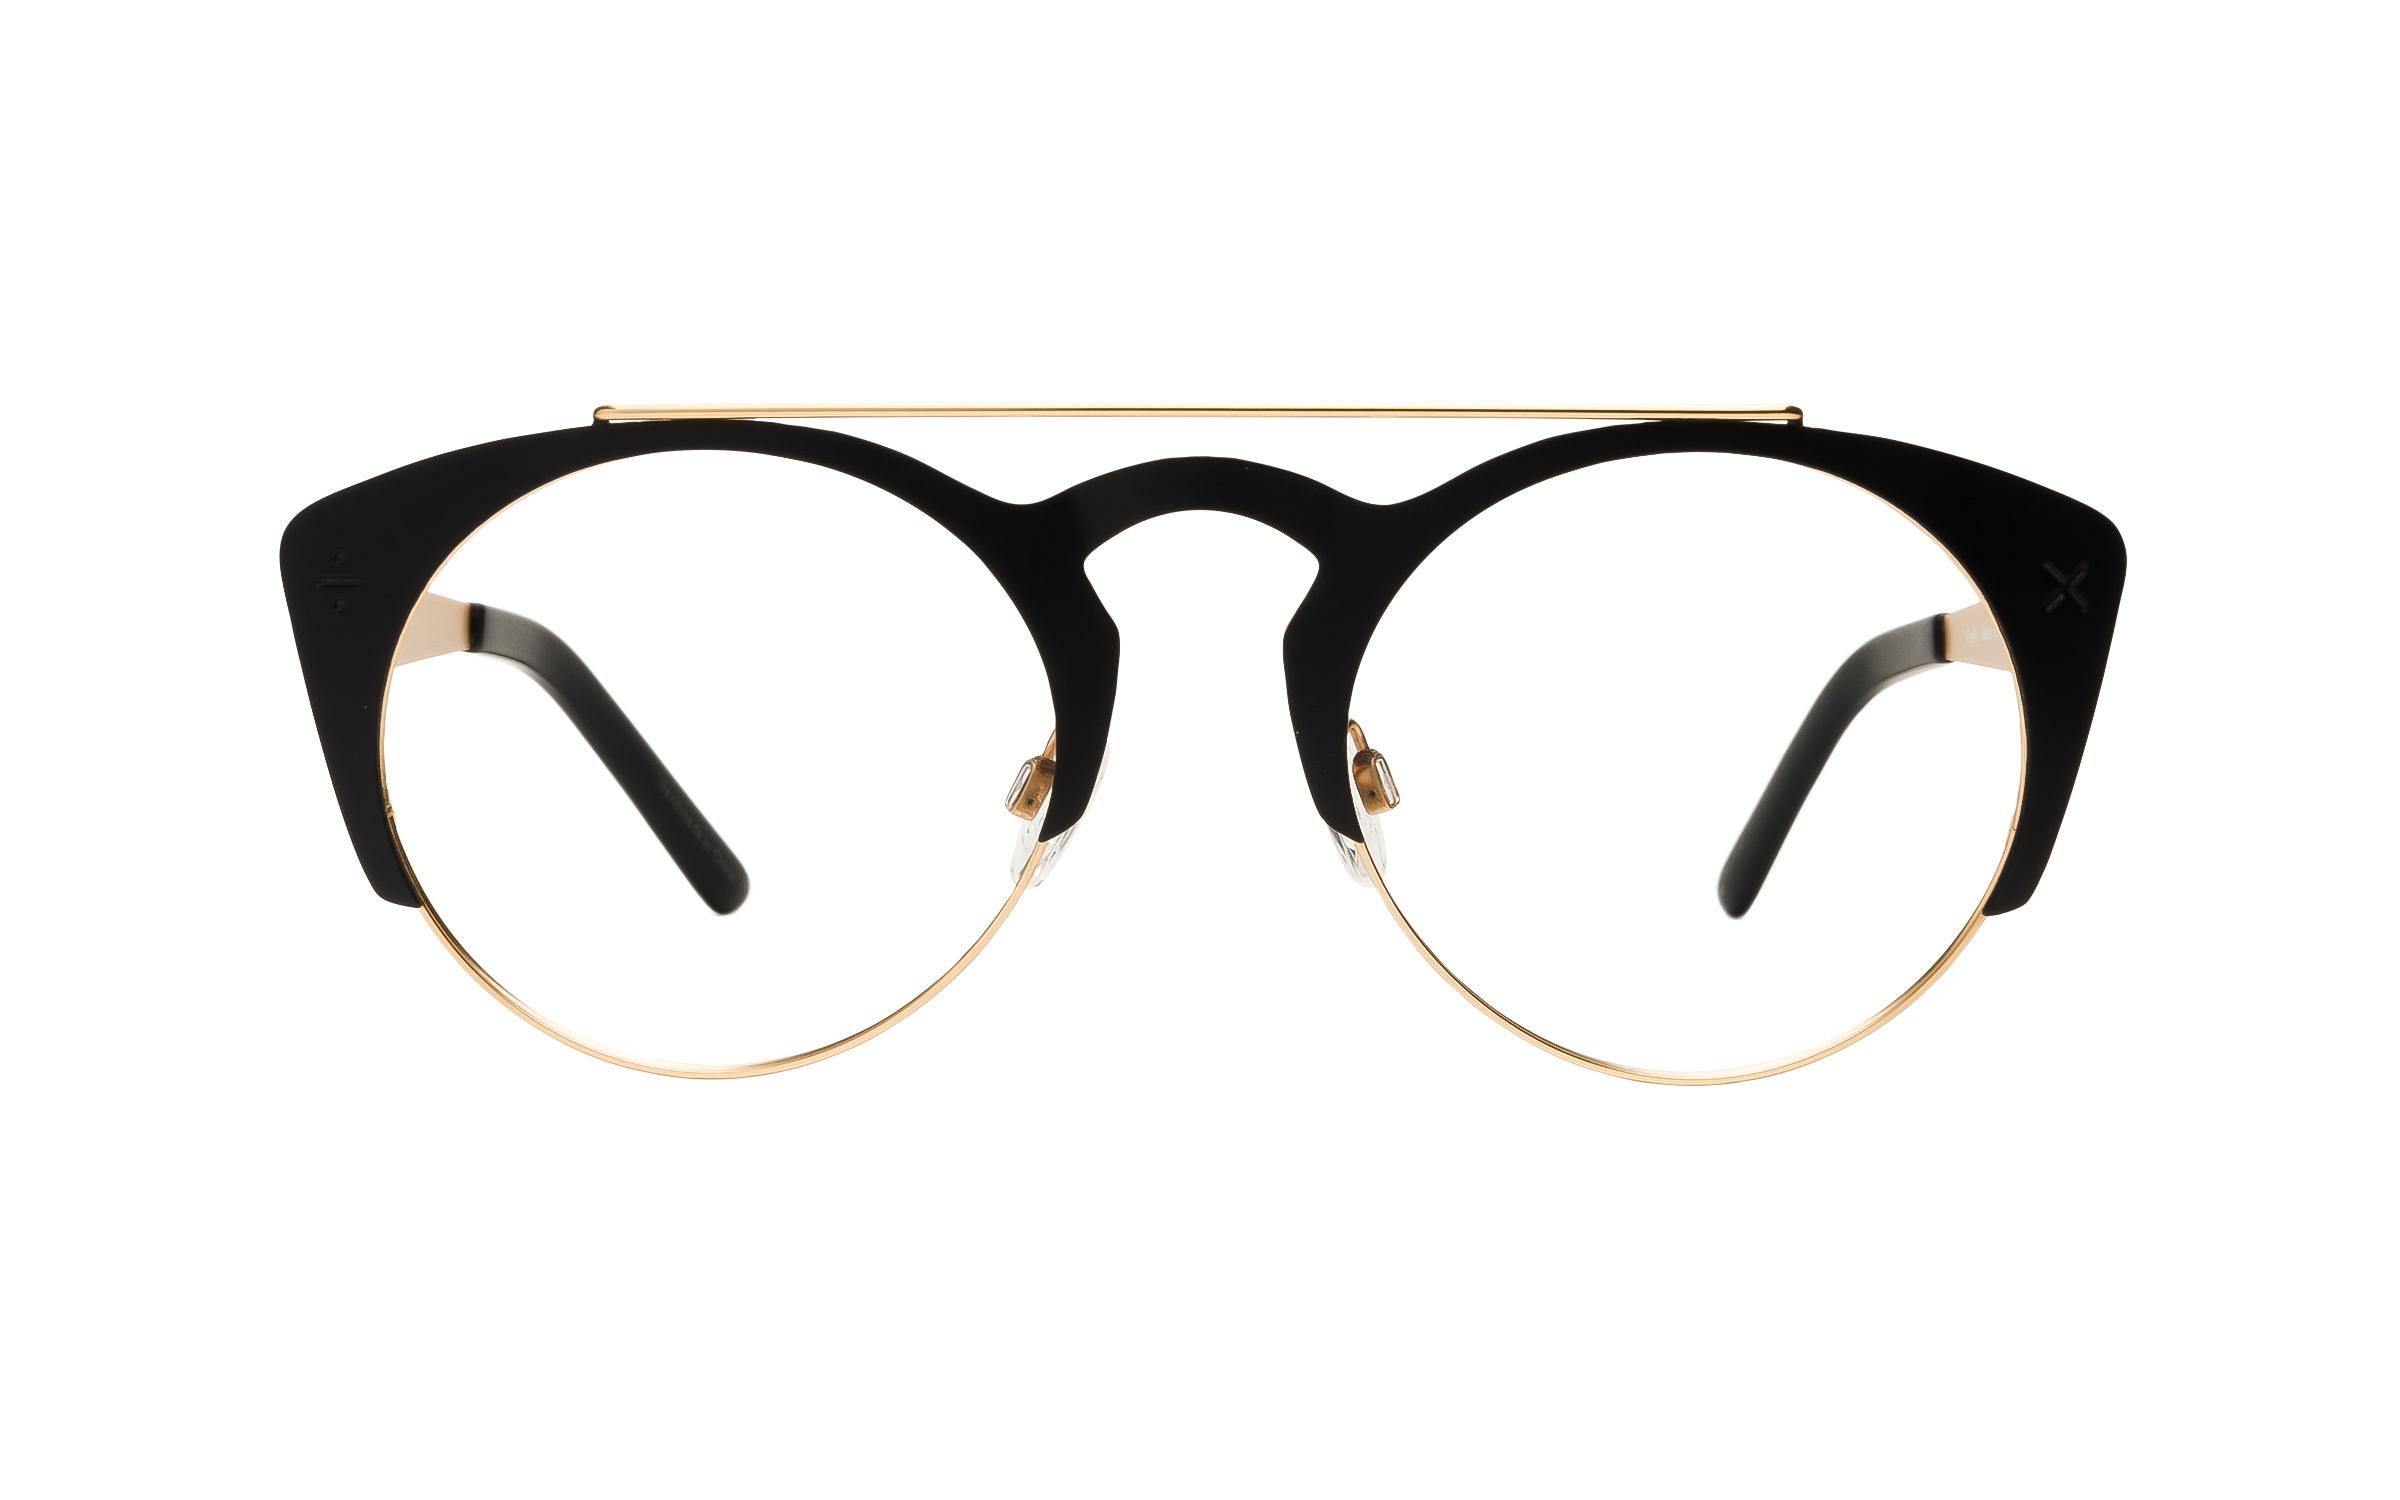 Derek Cardigan Firefly Eyeglasses And Frame In Matte Black , Metal